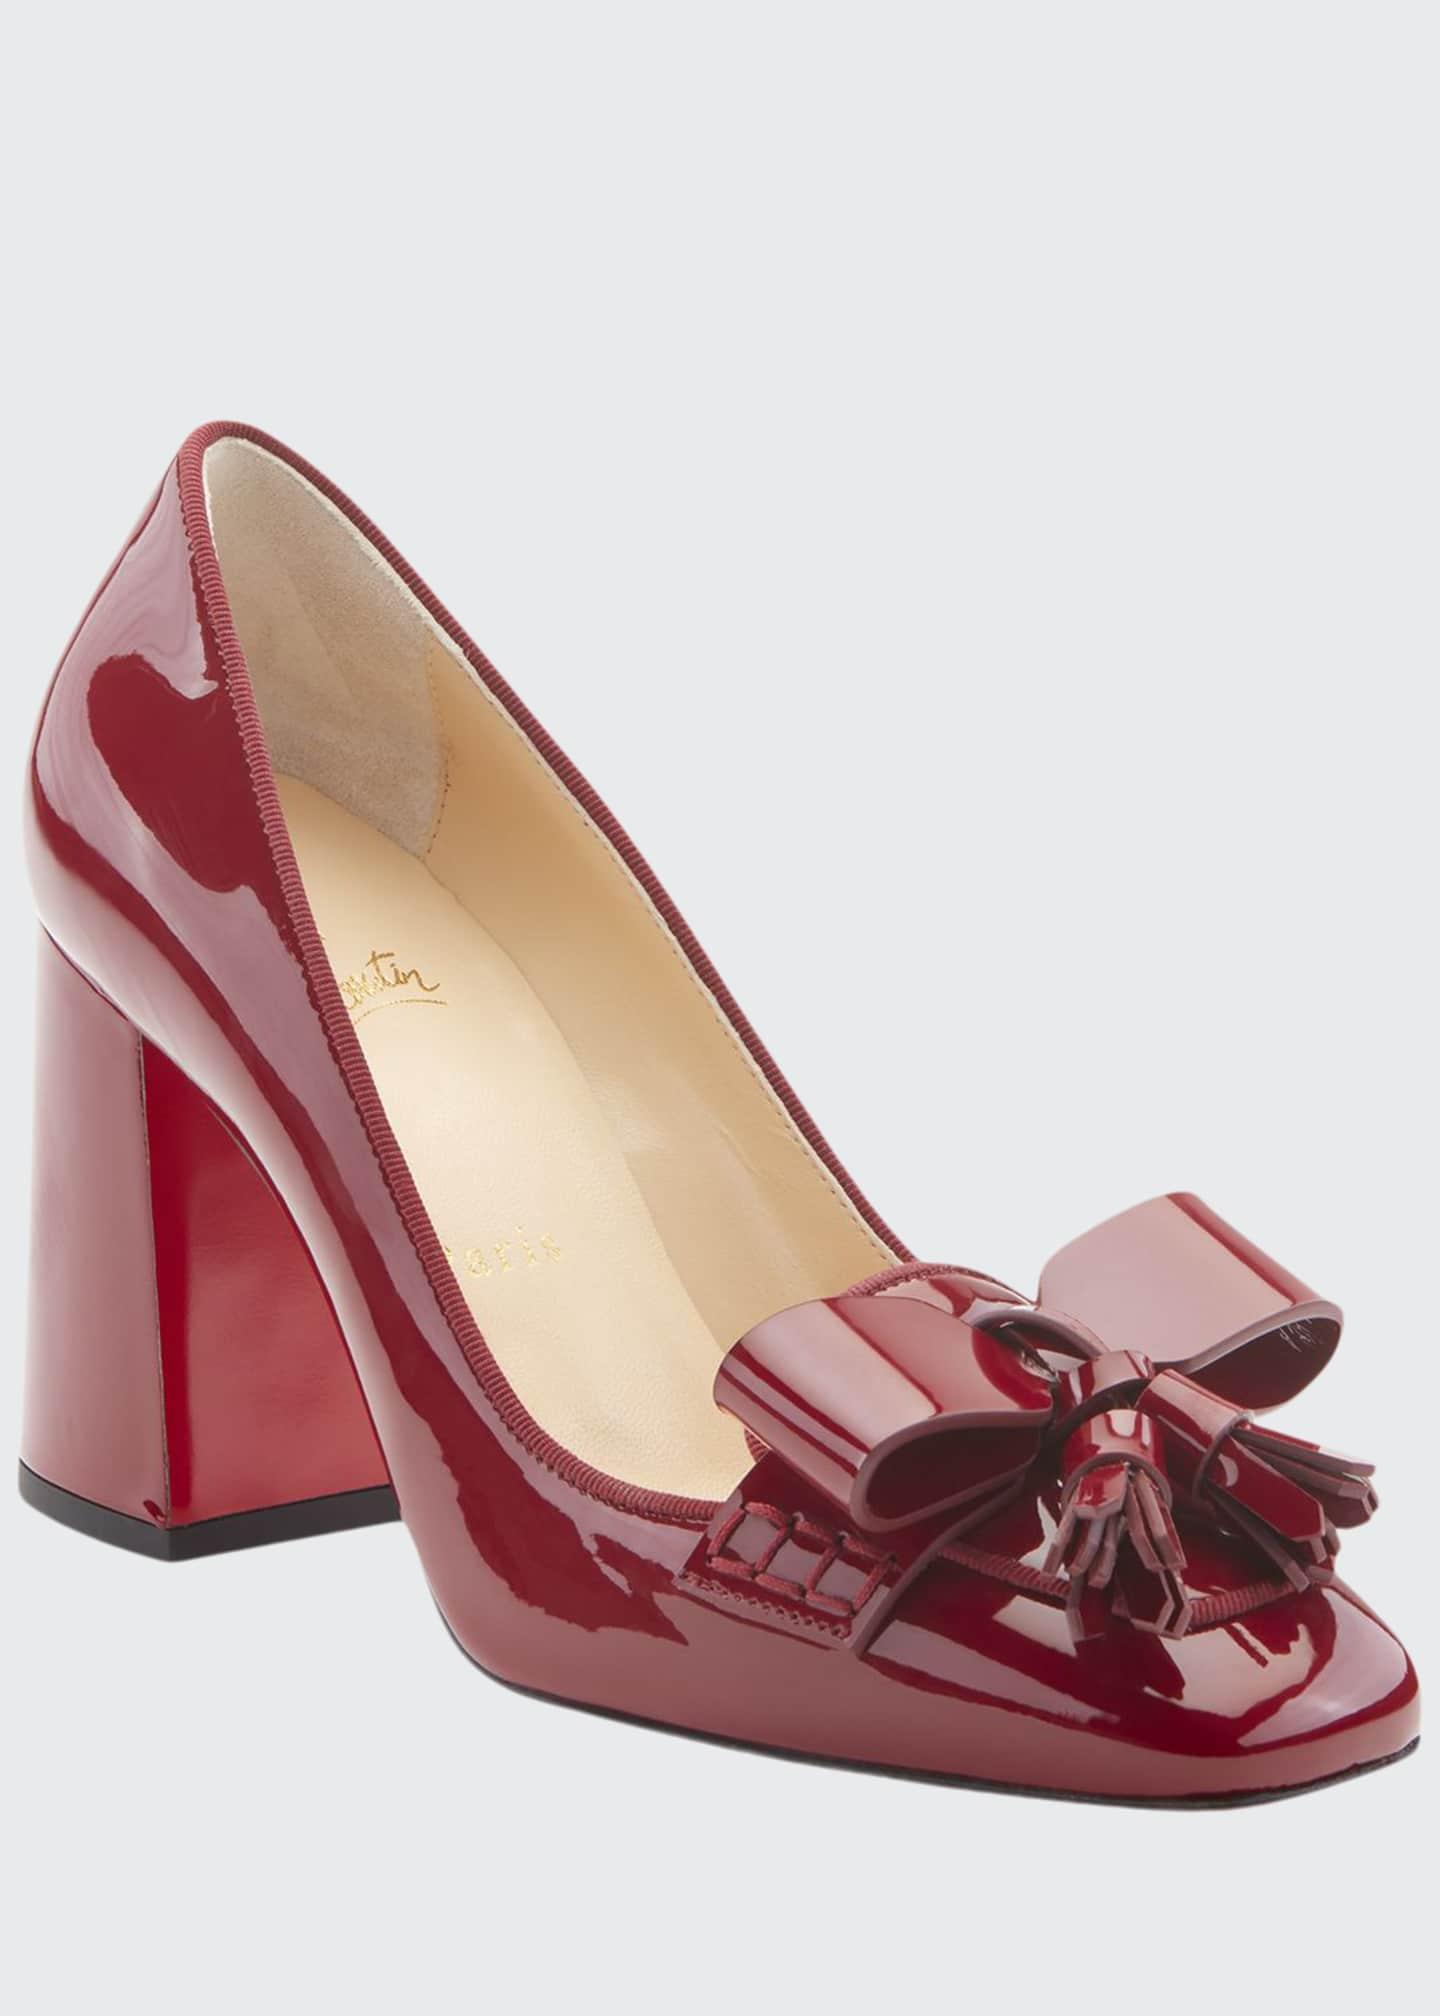 Christian Louboutin Carmela Patent Leather Bow & Tassel